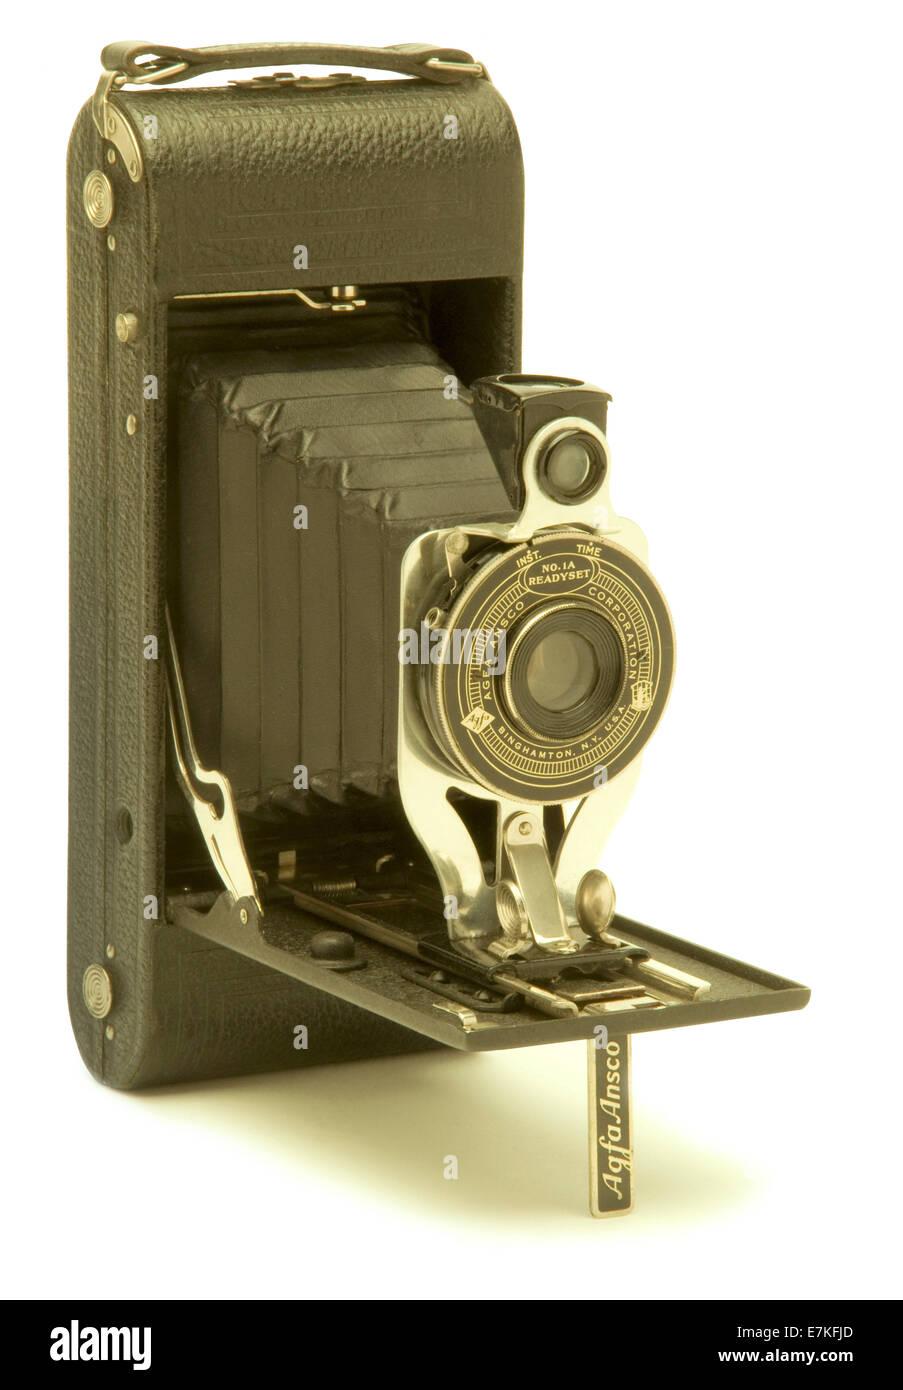 Vintage Agfa Ansco folding bellows film camera against white background - Stock Image